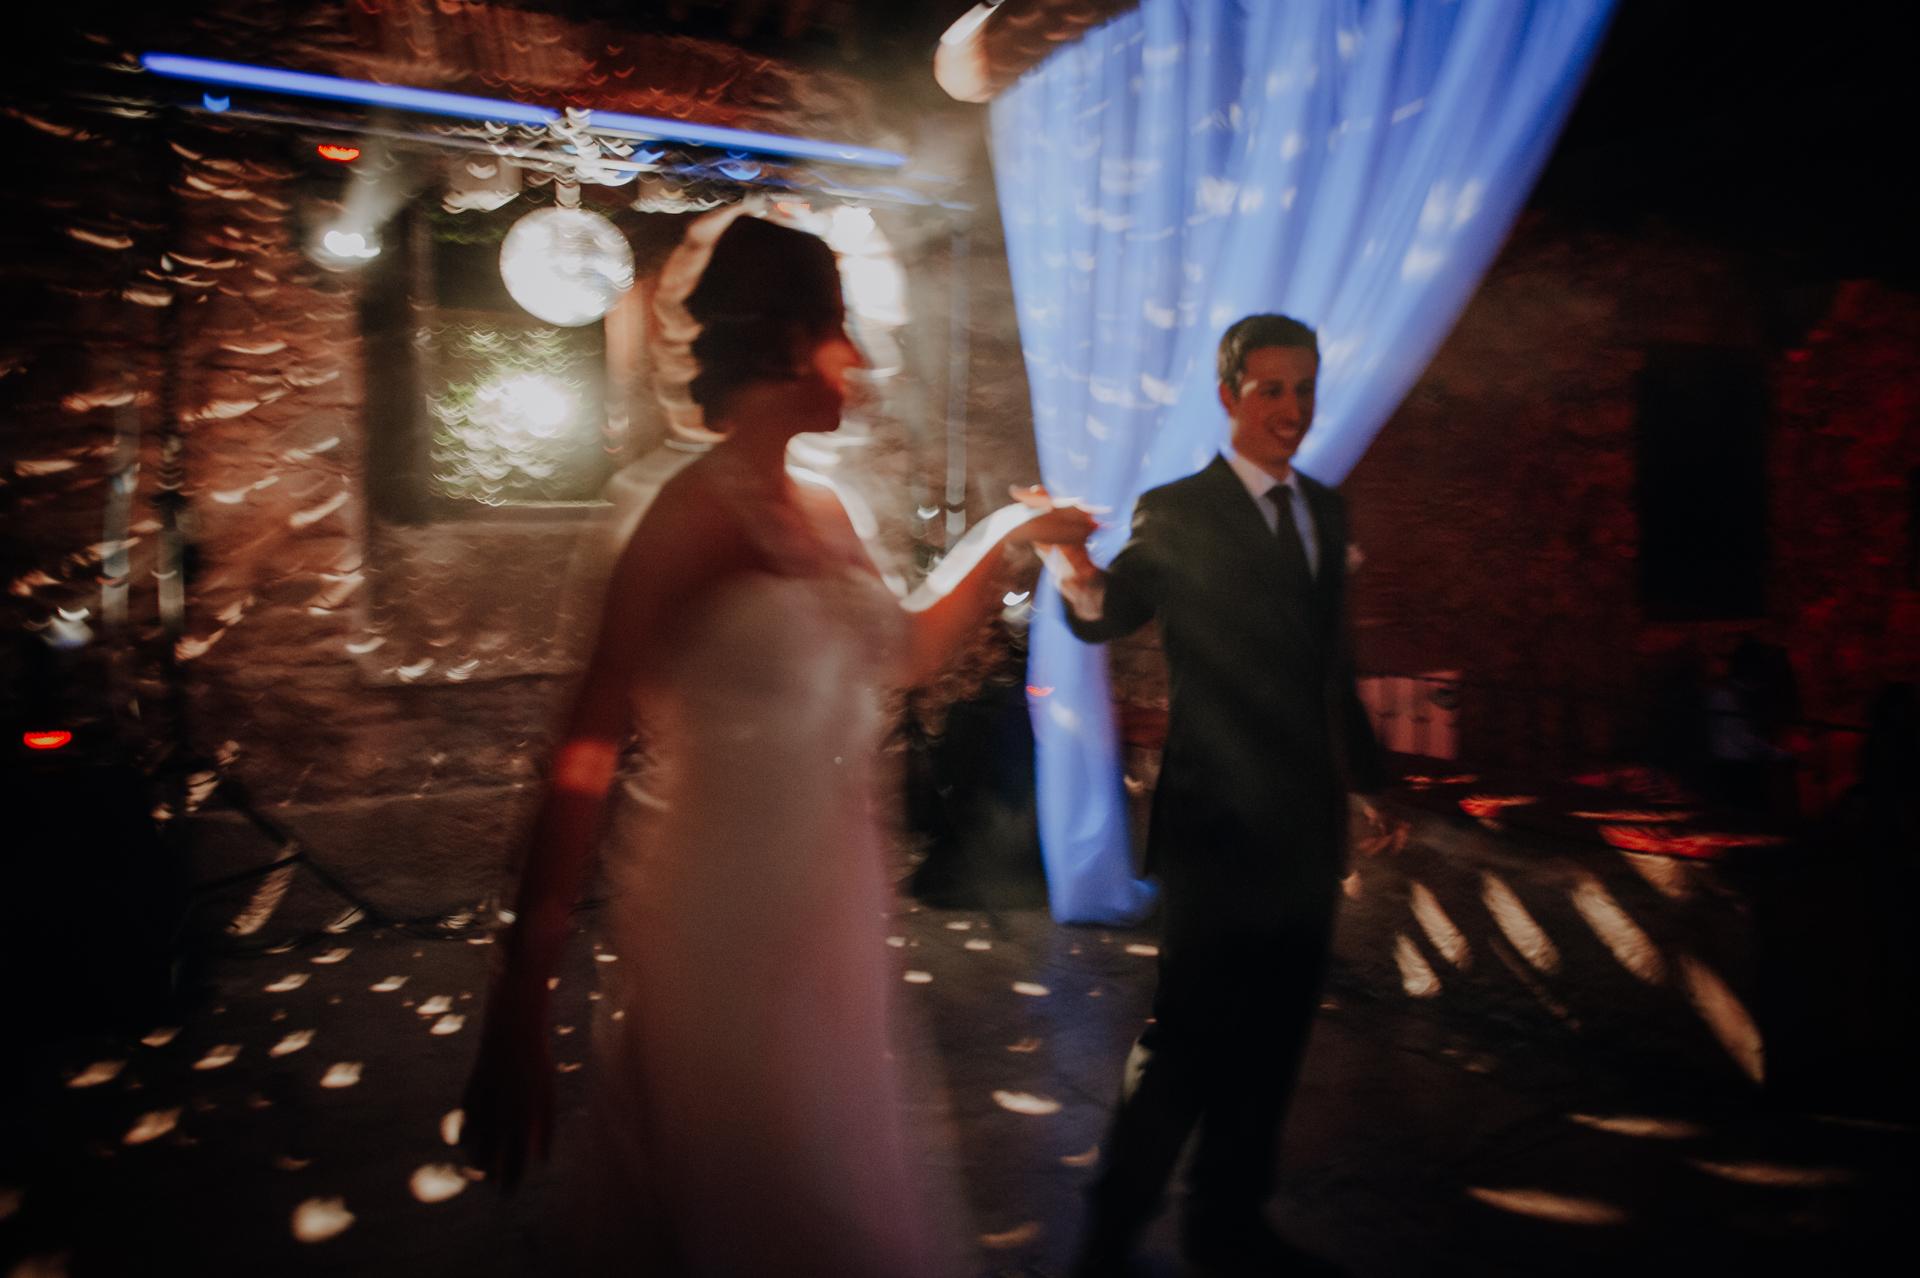 Quinta de Valle do Riacho - Lisbon Wedding Photography   The bright colors of the wedding ceremony